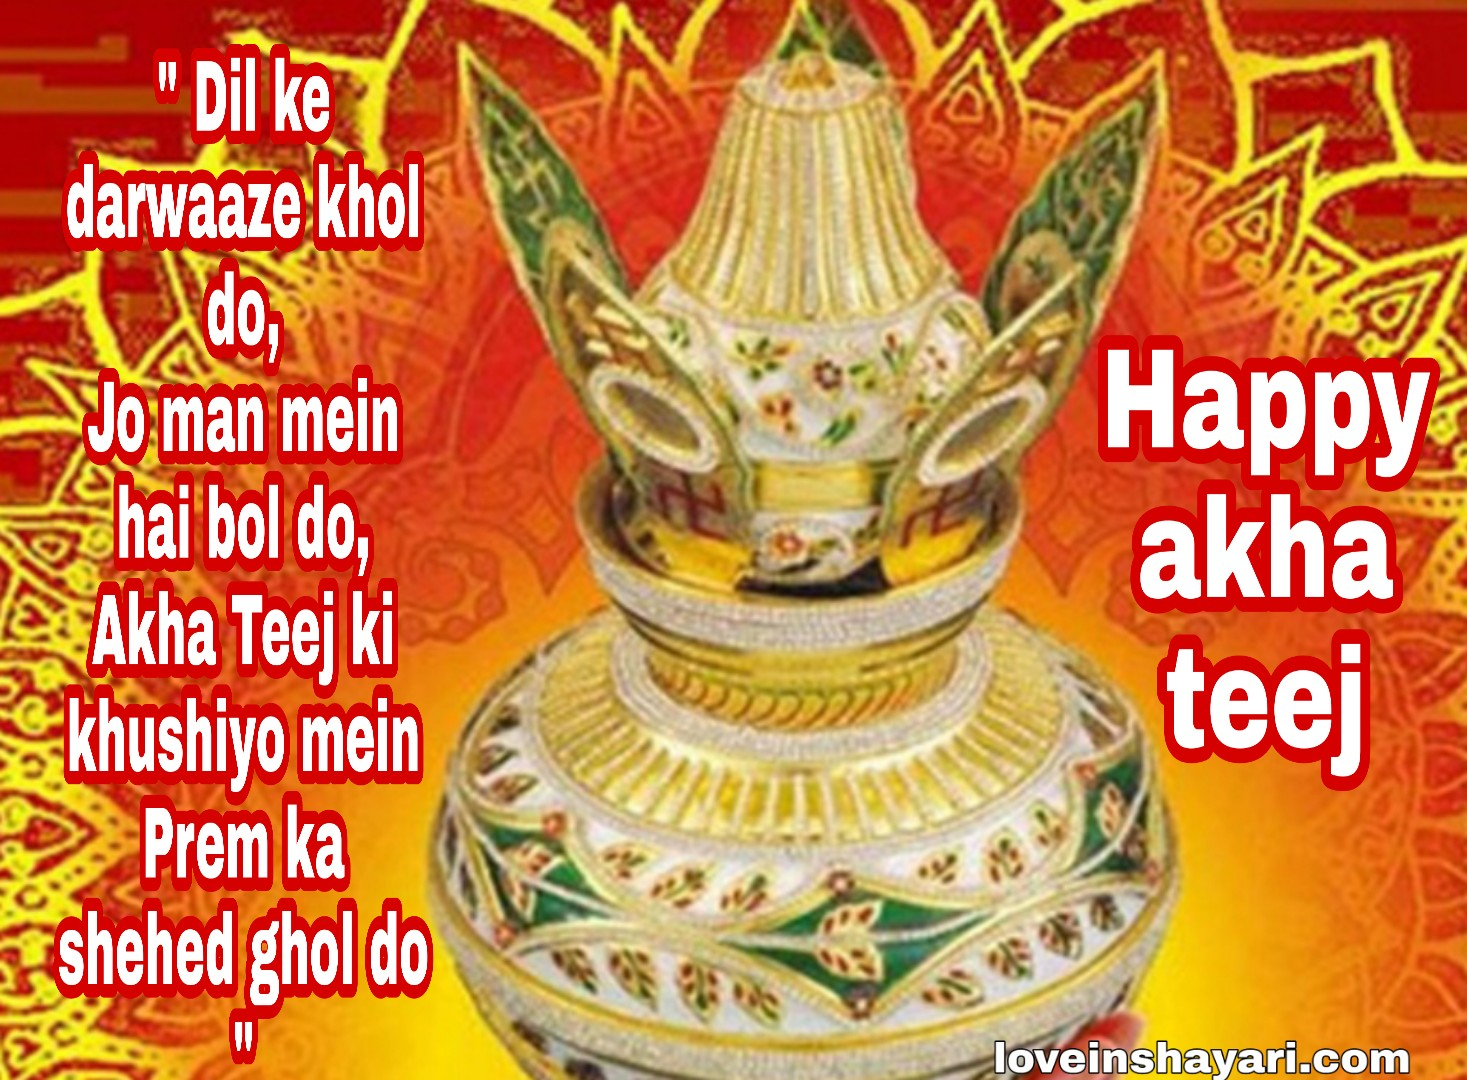 Akha Teej images